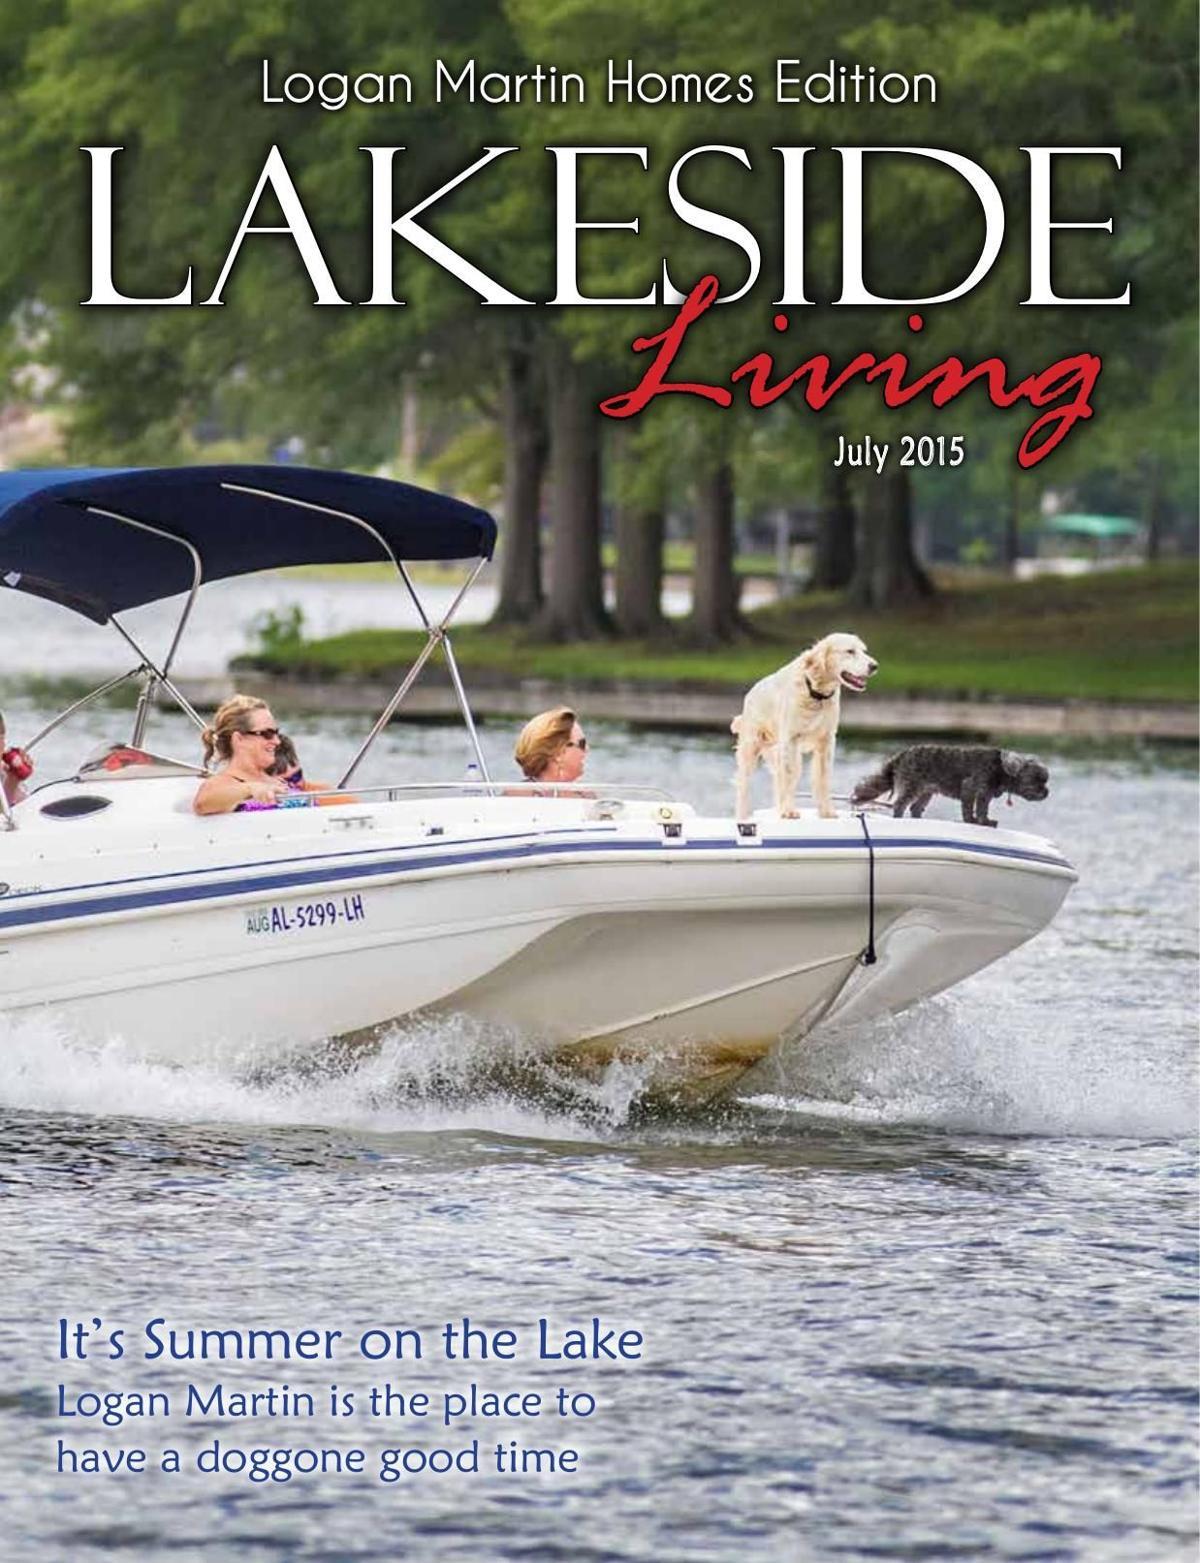 Lakeside - July 2015